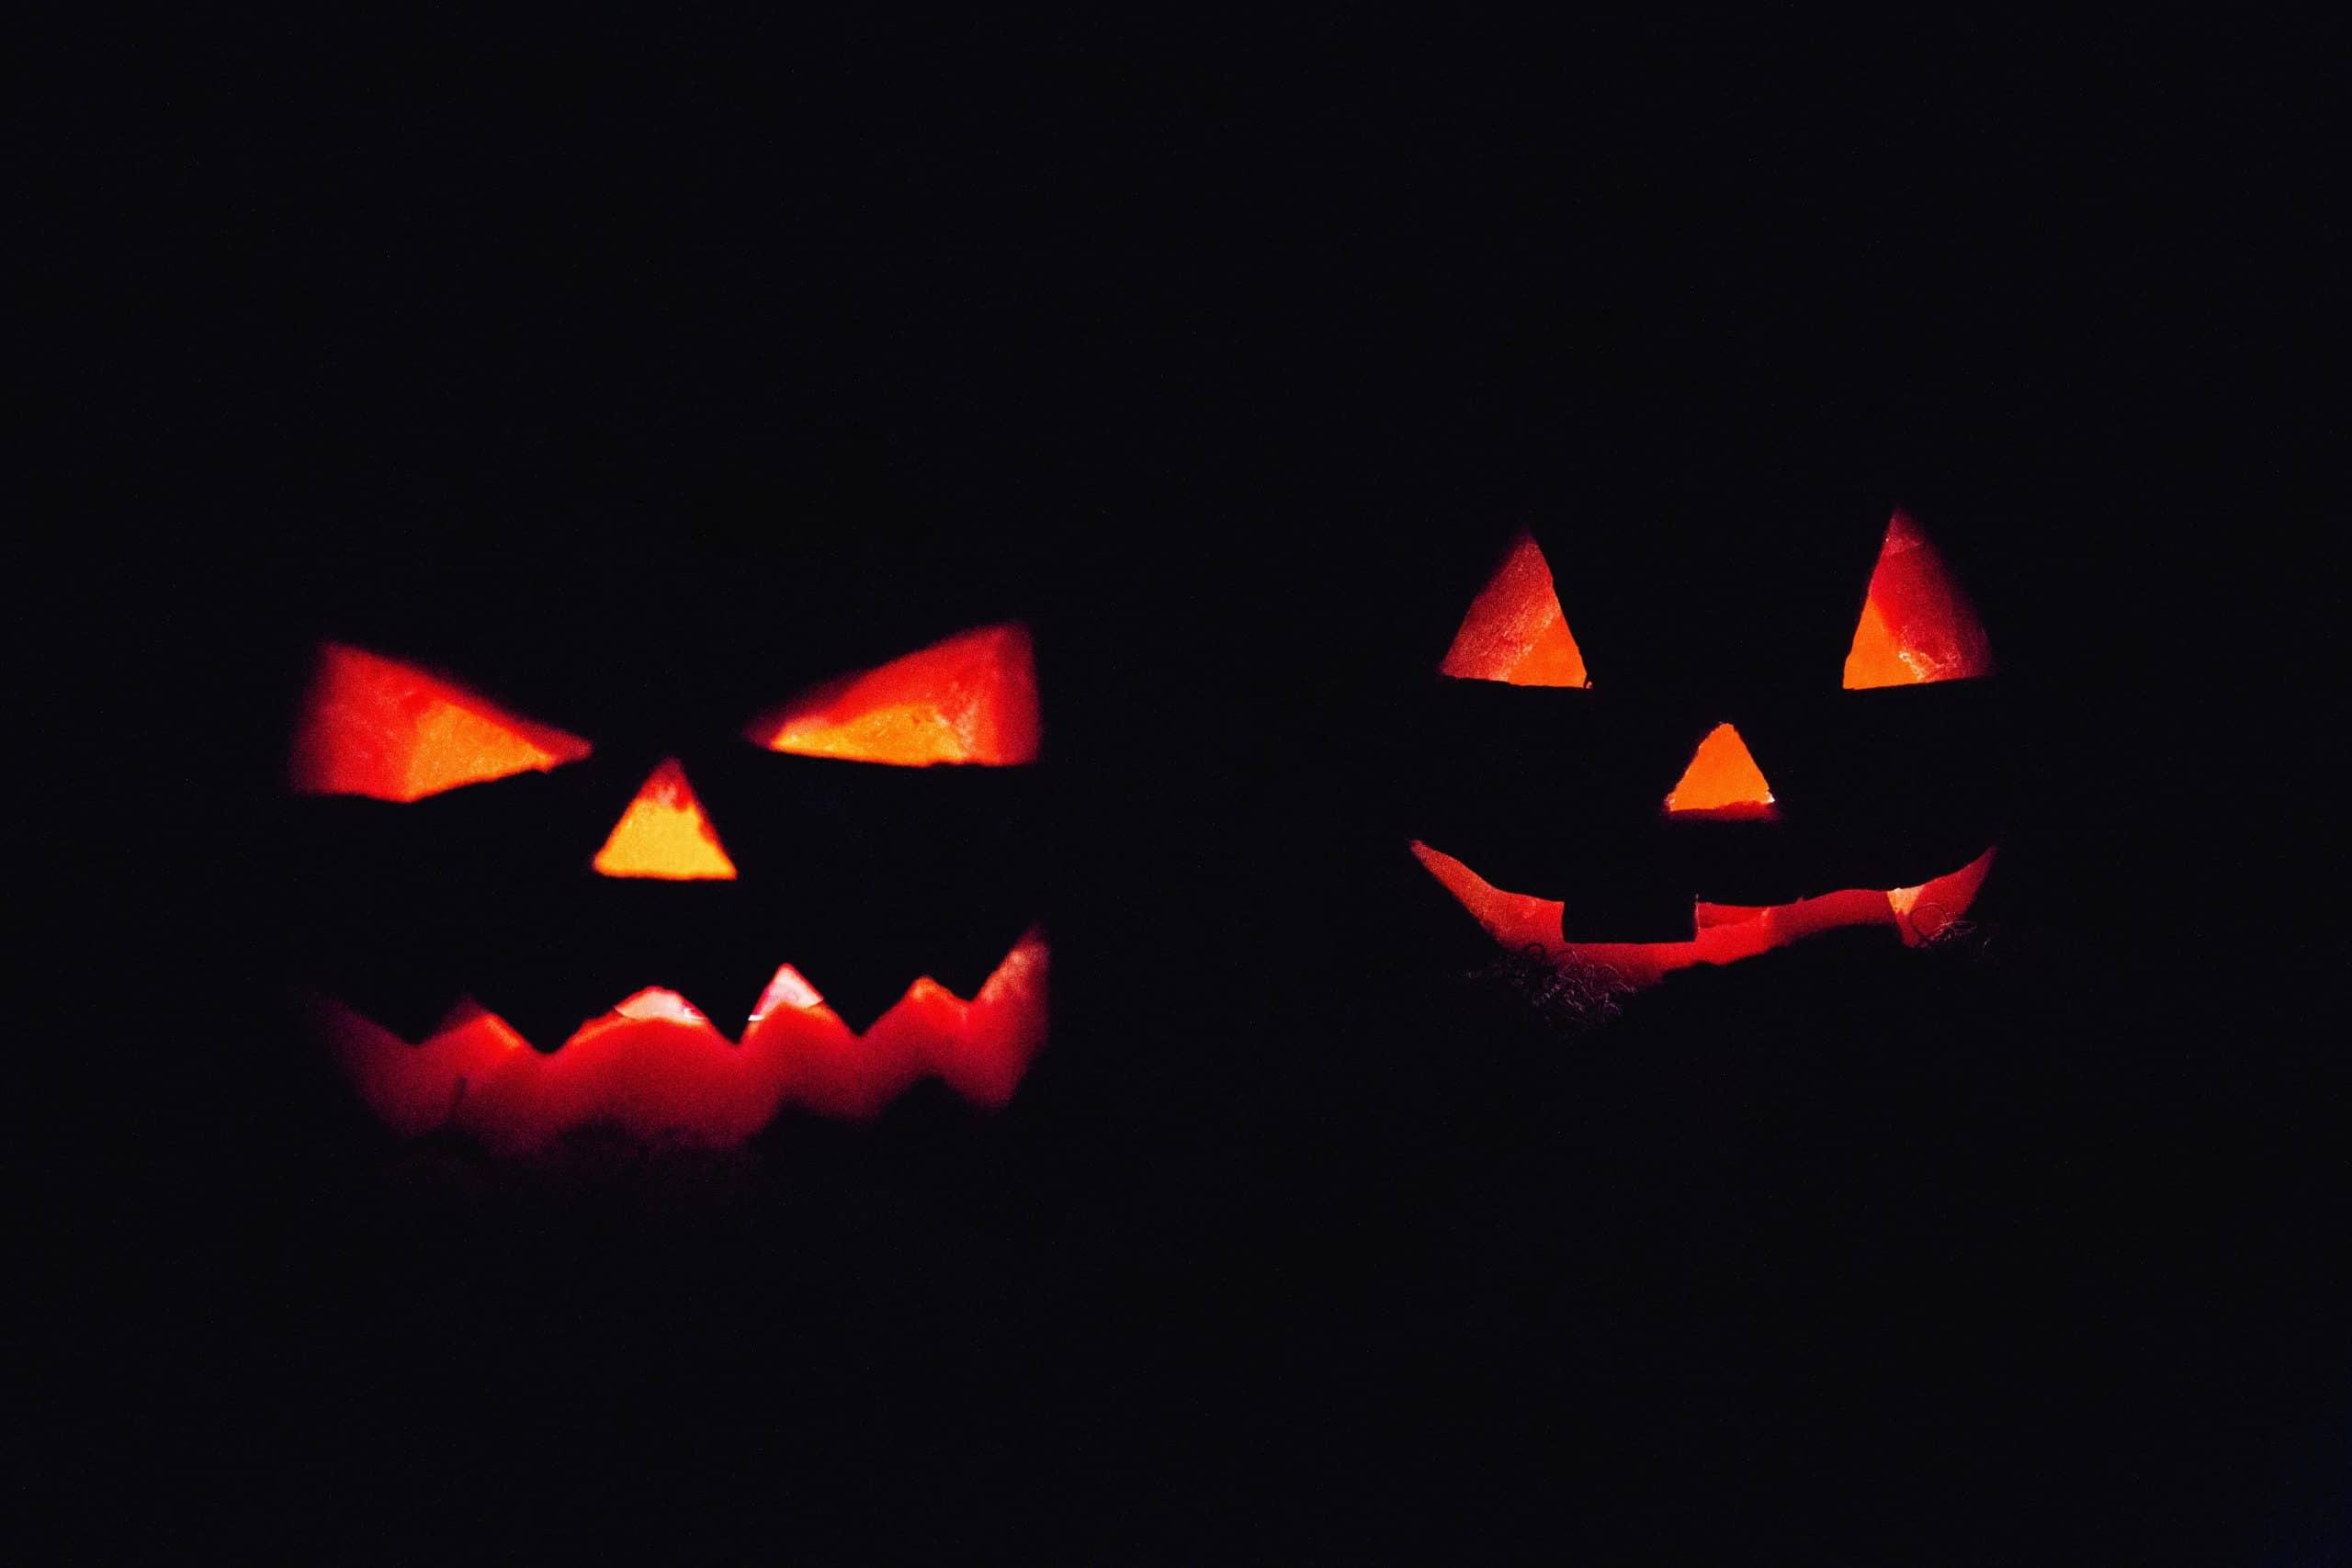 Abóboras de halloween acesas